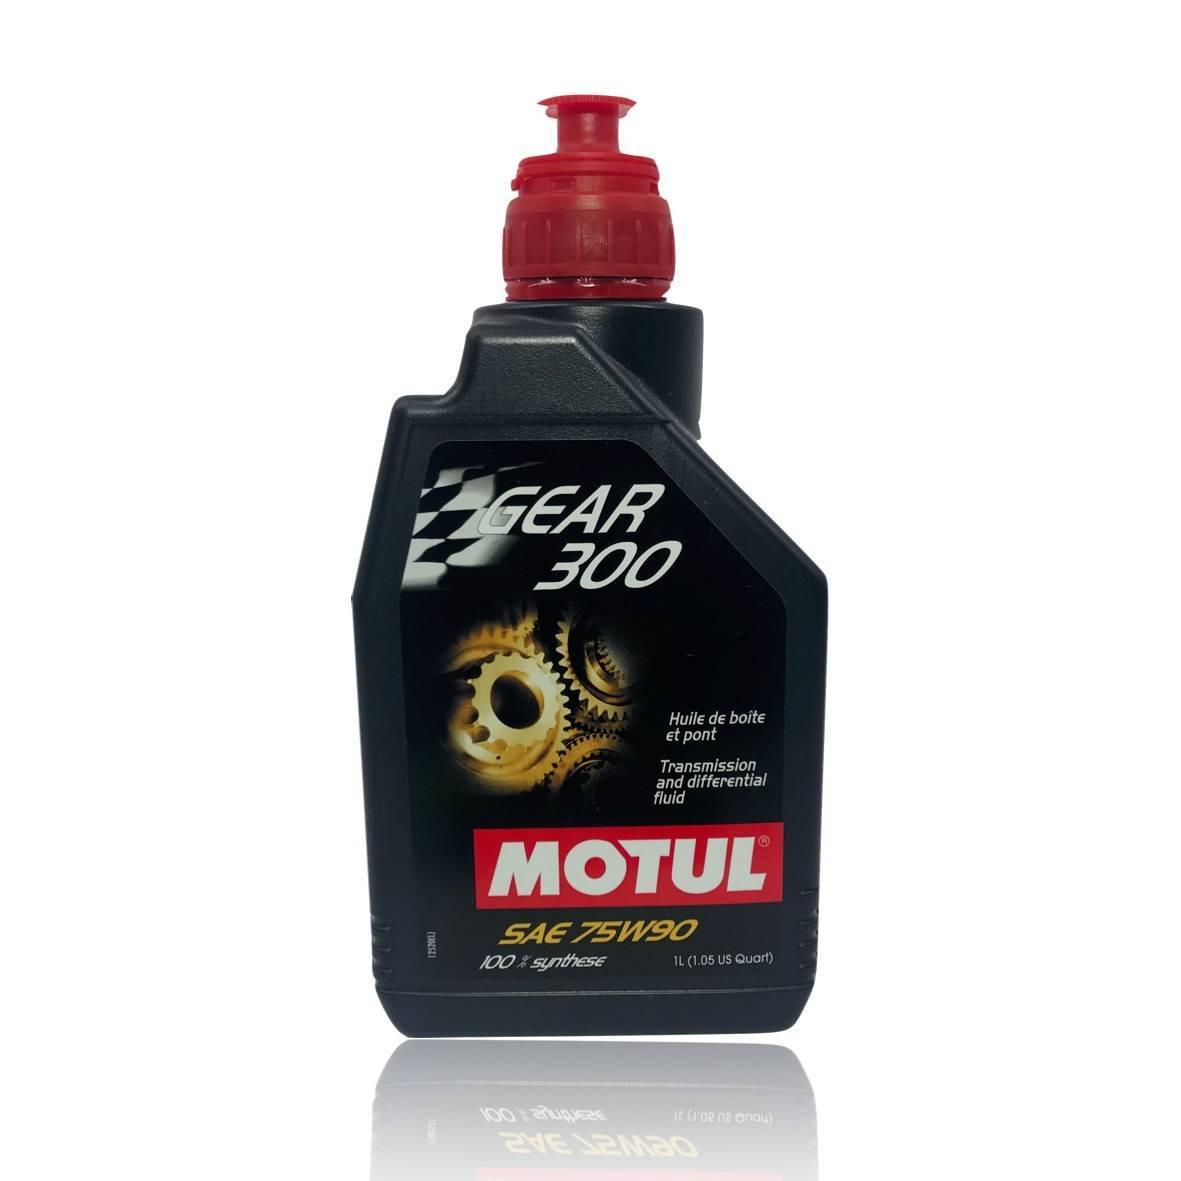 Gear 300 75W90 - API GL-4/GL-5 - 1 litro - PerformanceLUB Lubrificantes Premium